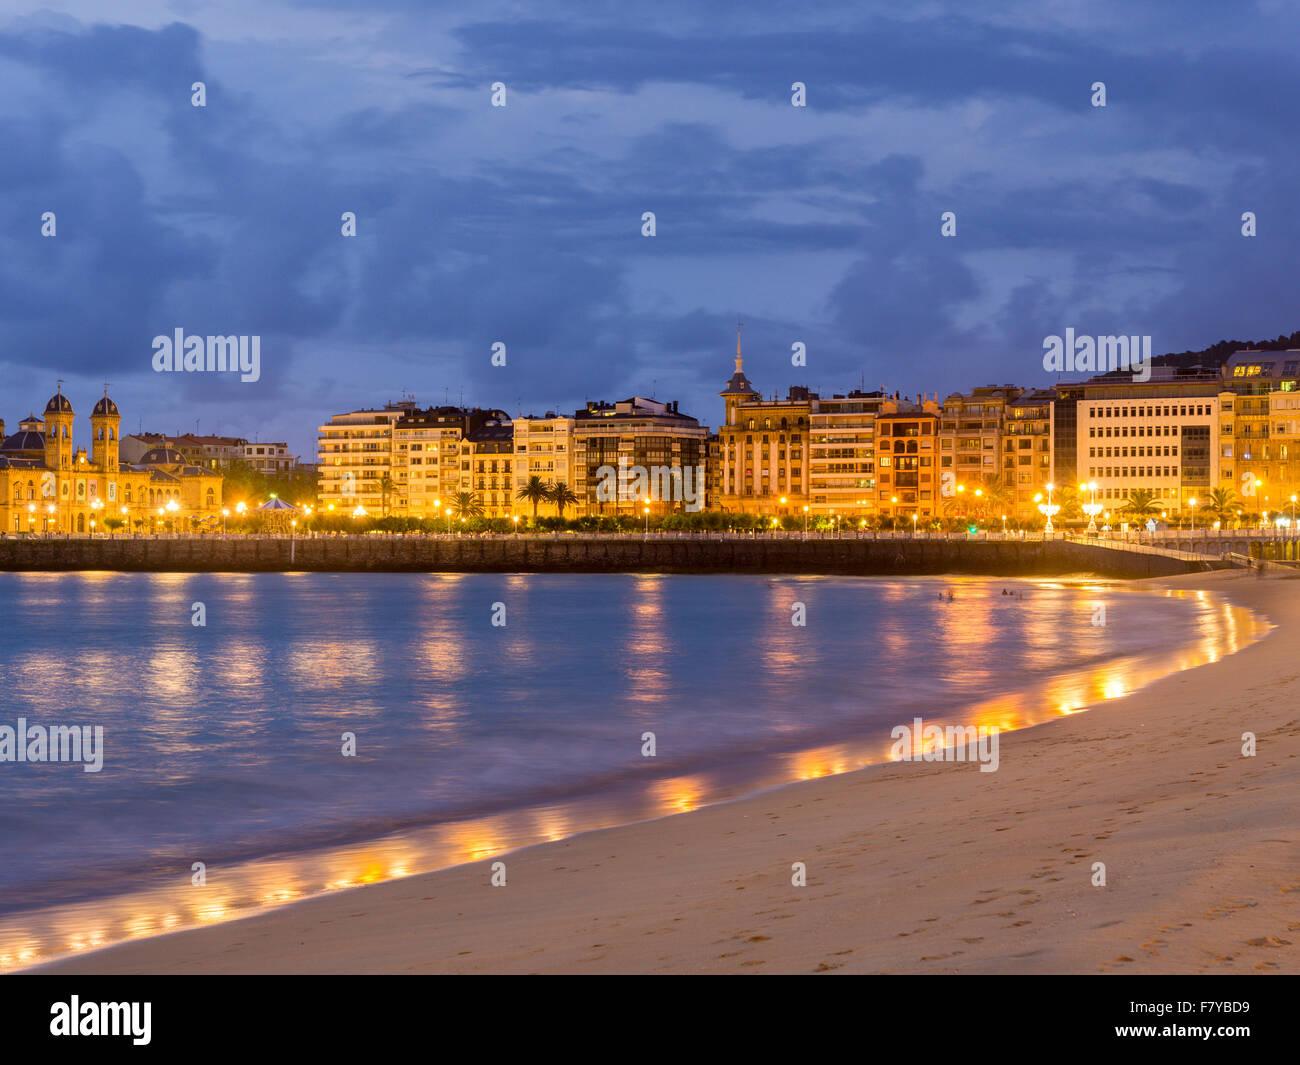 Beach in the evening, San Sebastian or Donostia, Basque Country, Spain - Stock Image